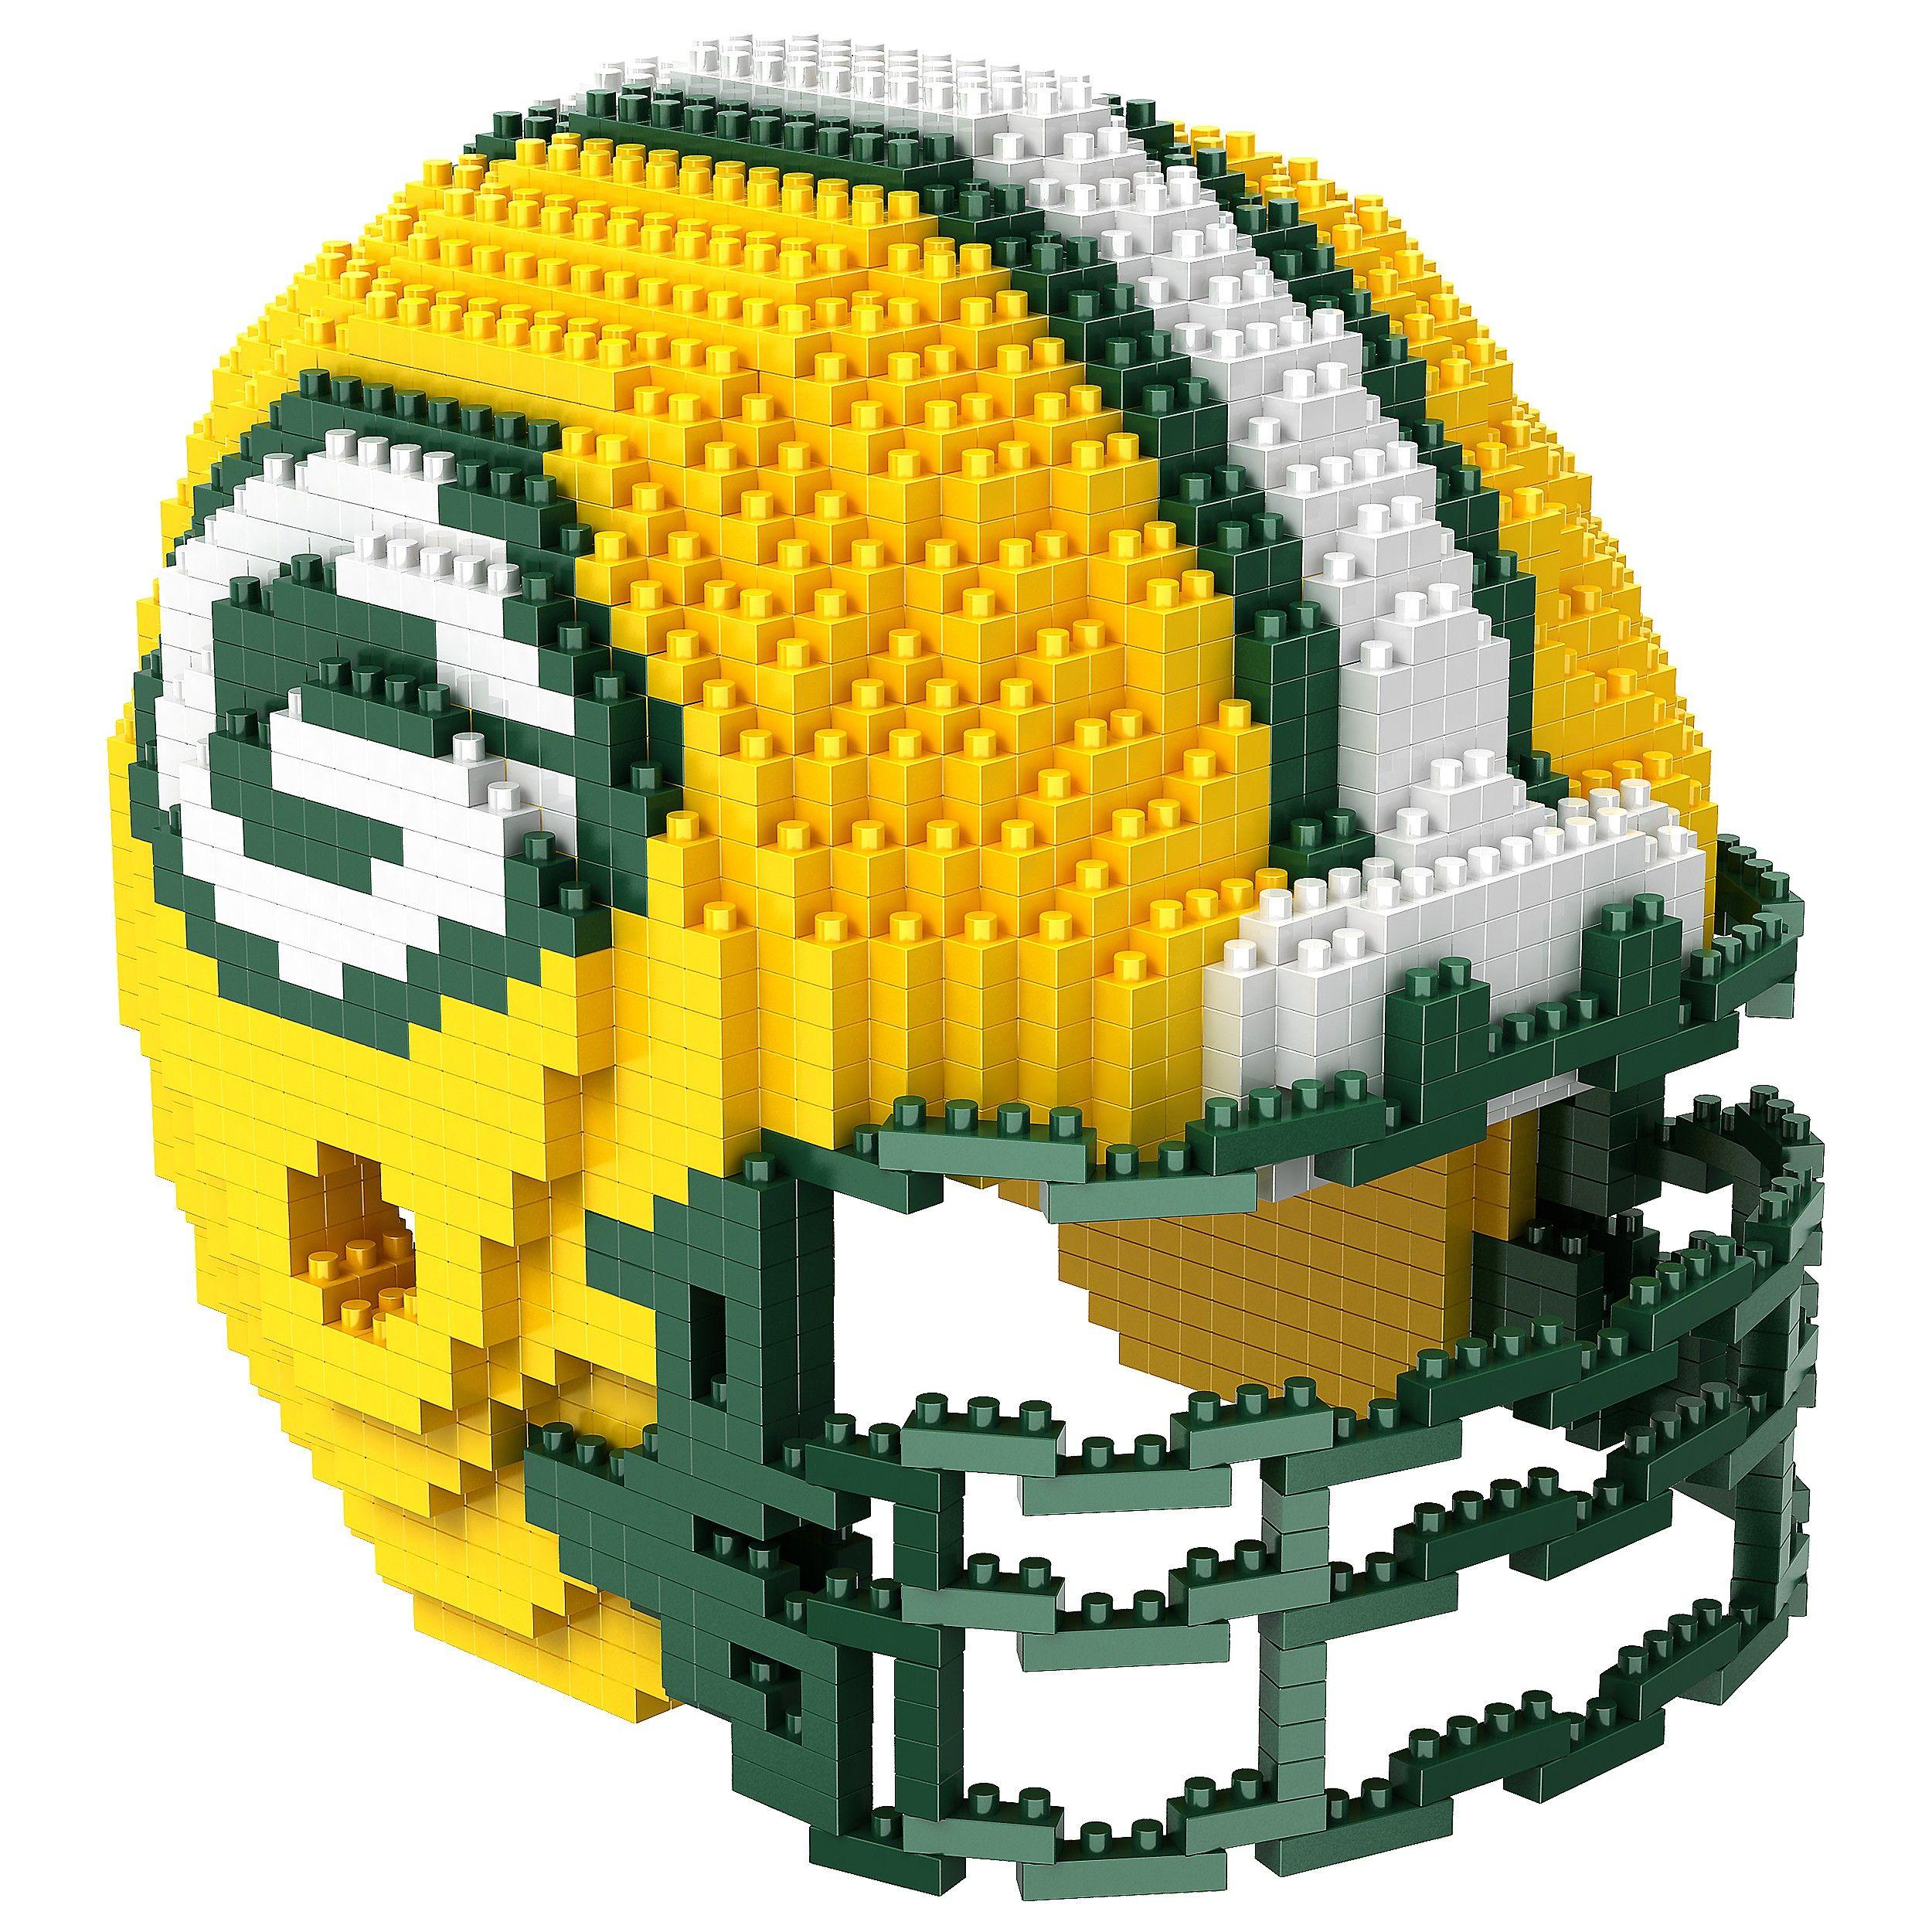 Green Bay Packers 3d Brxlz Helmet Construction Toy Green Bay Packers Helmet Nfl Packers Nfl Green Bay